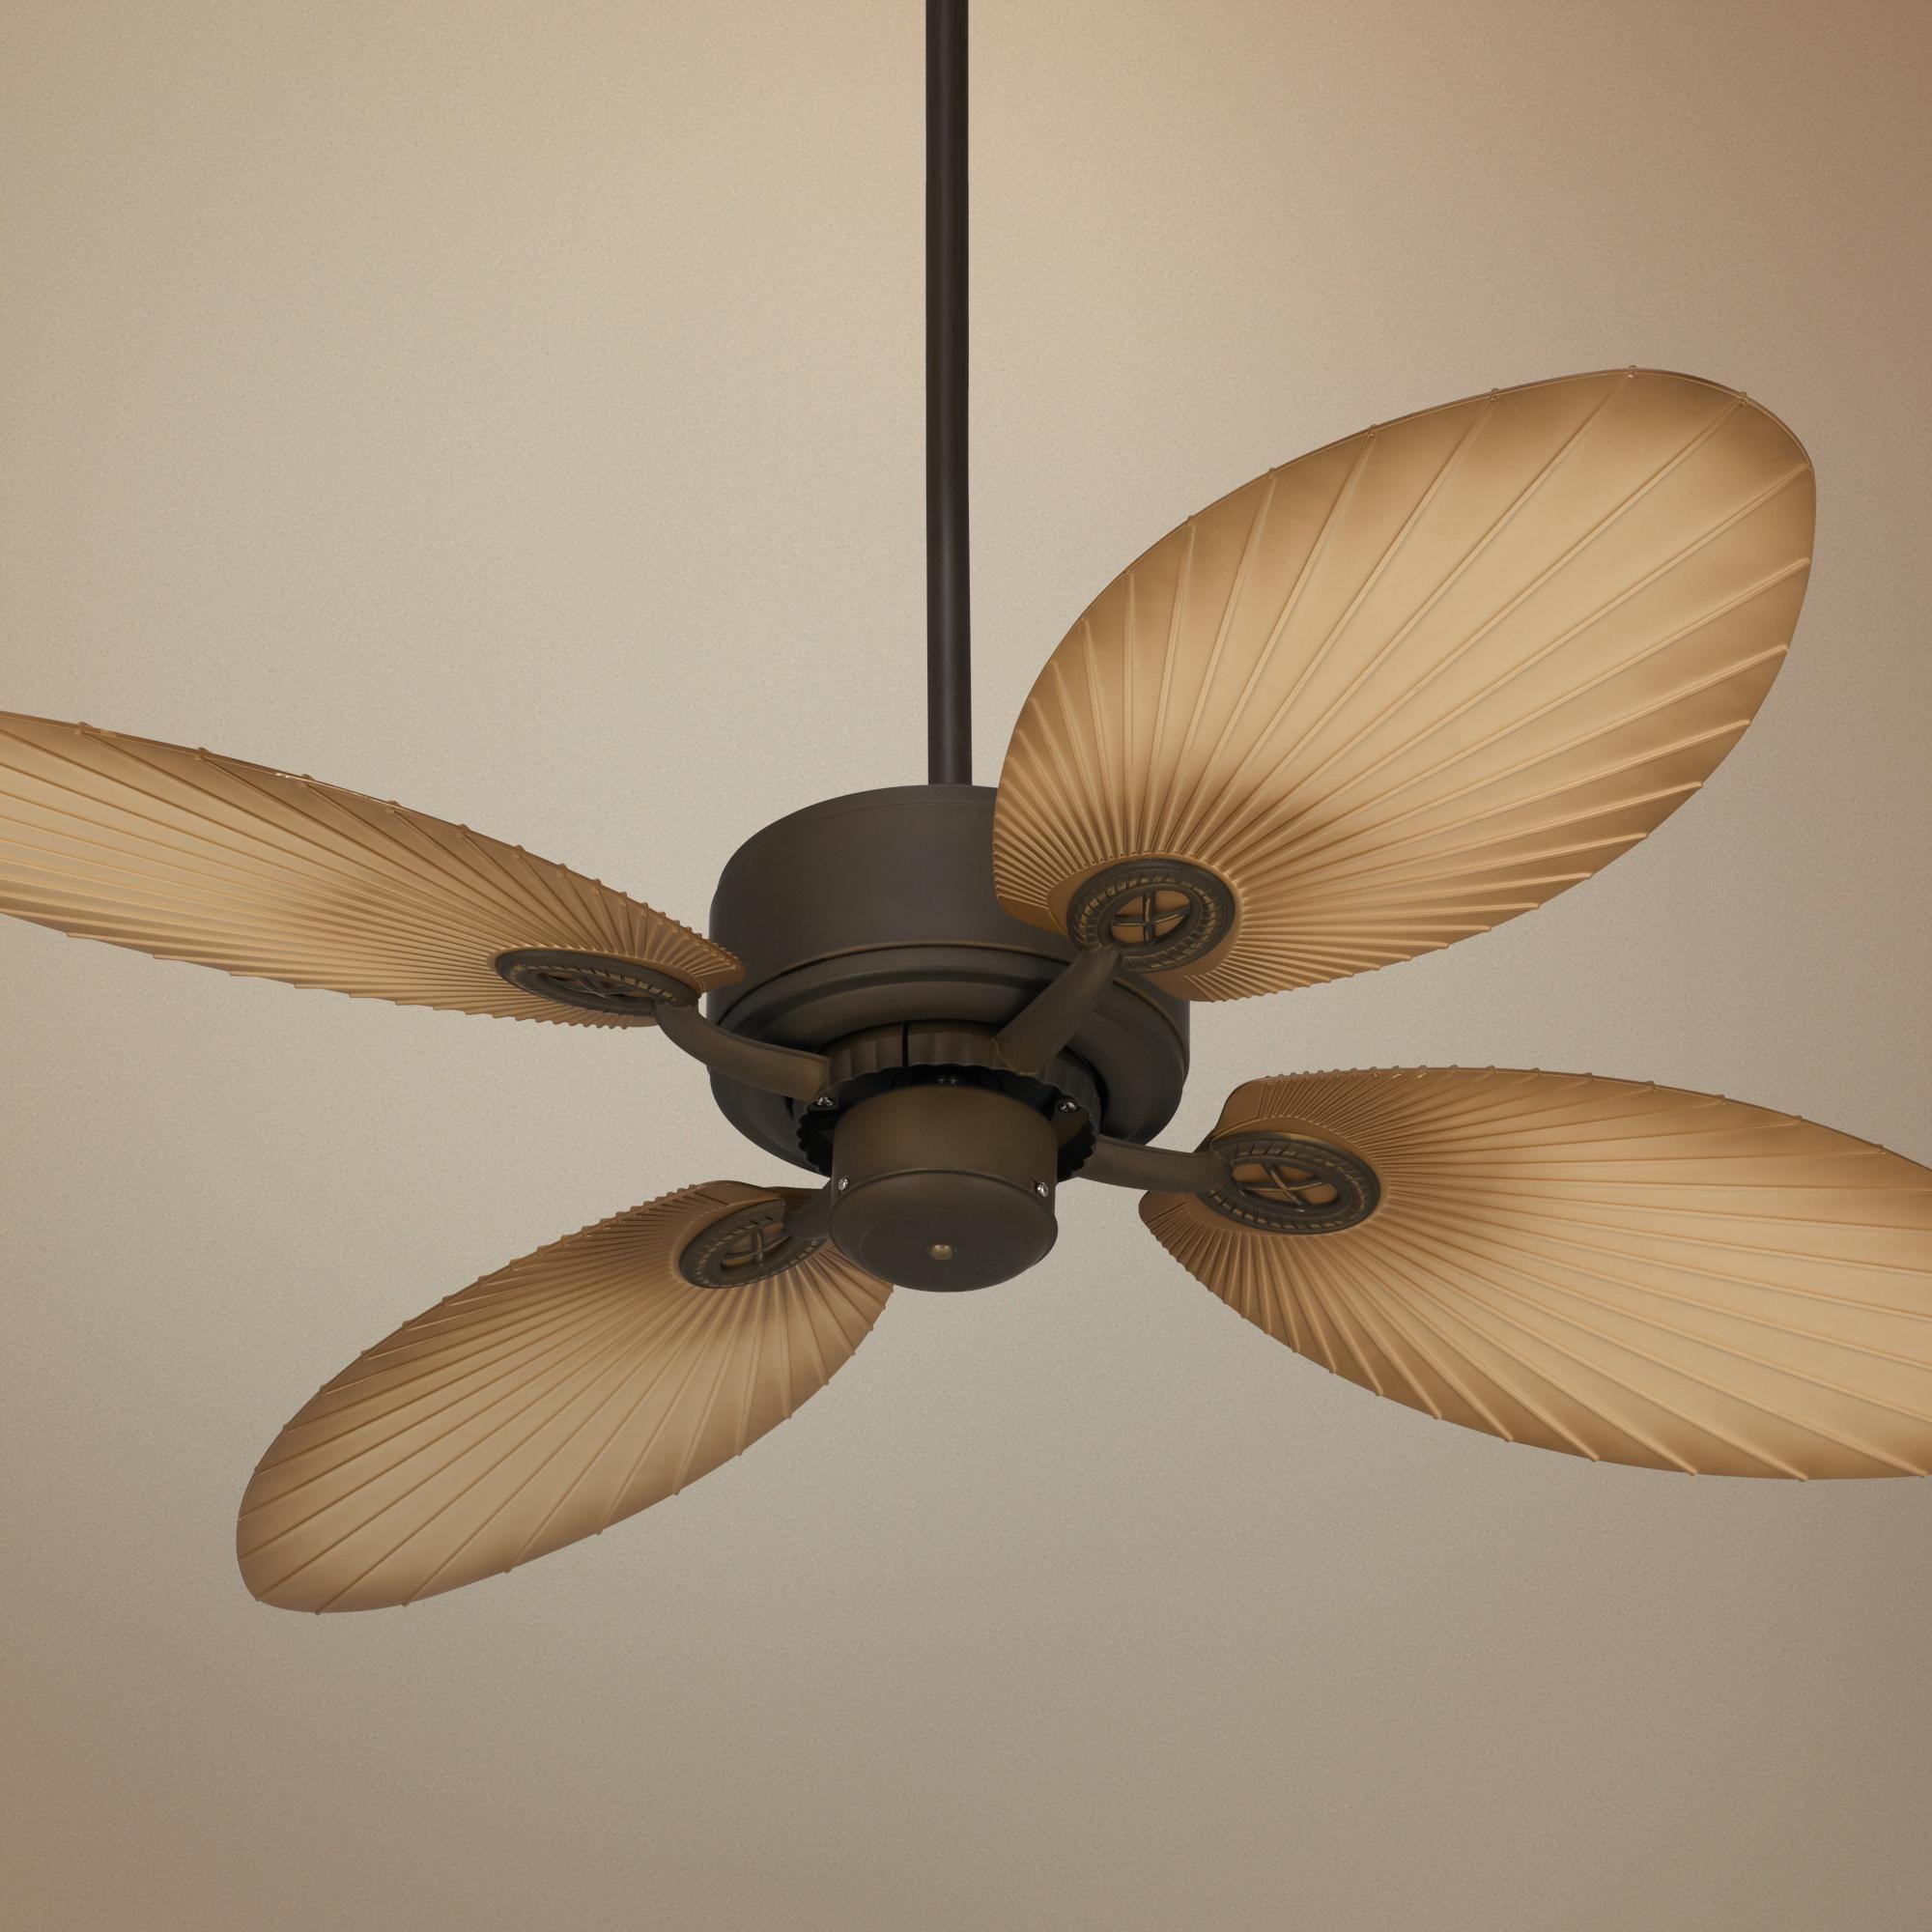 52 Casa Vieja Aerostat Palm Bronze Outdoor Ceiling Fan 11h83 Lamps Plus Ceiling Fan Outdoor Ceiling Fans Ceiling Fans Without Lights